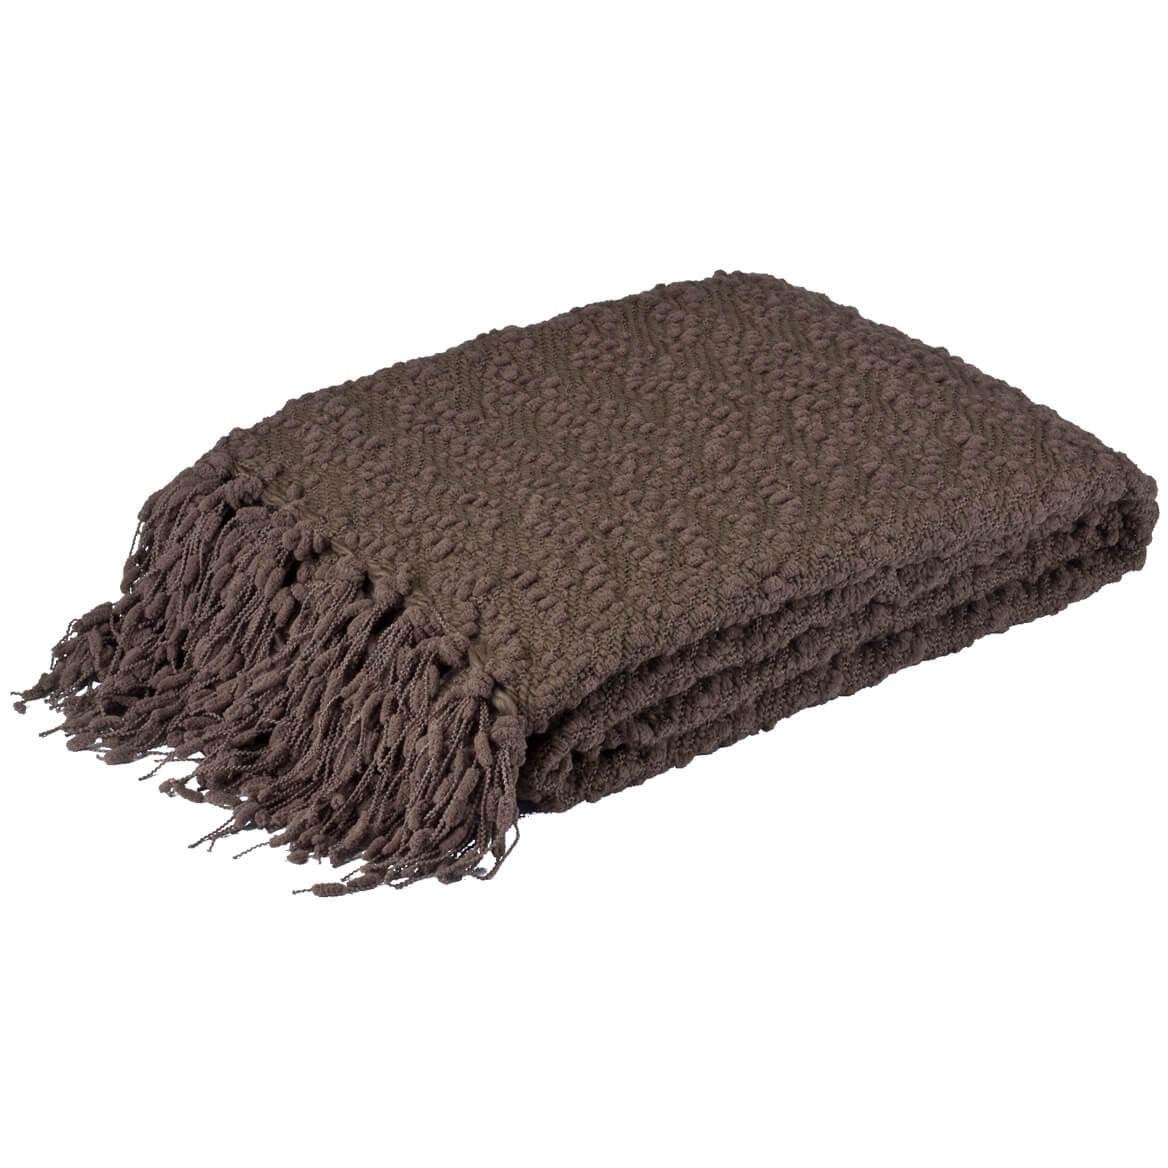 The Pompom Yarn Throw by OakRidge™